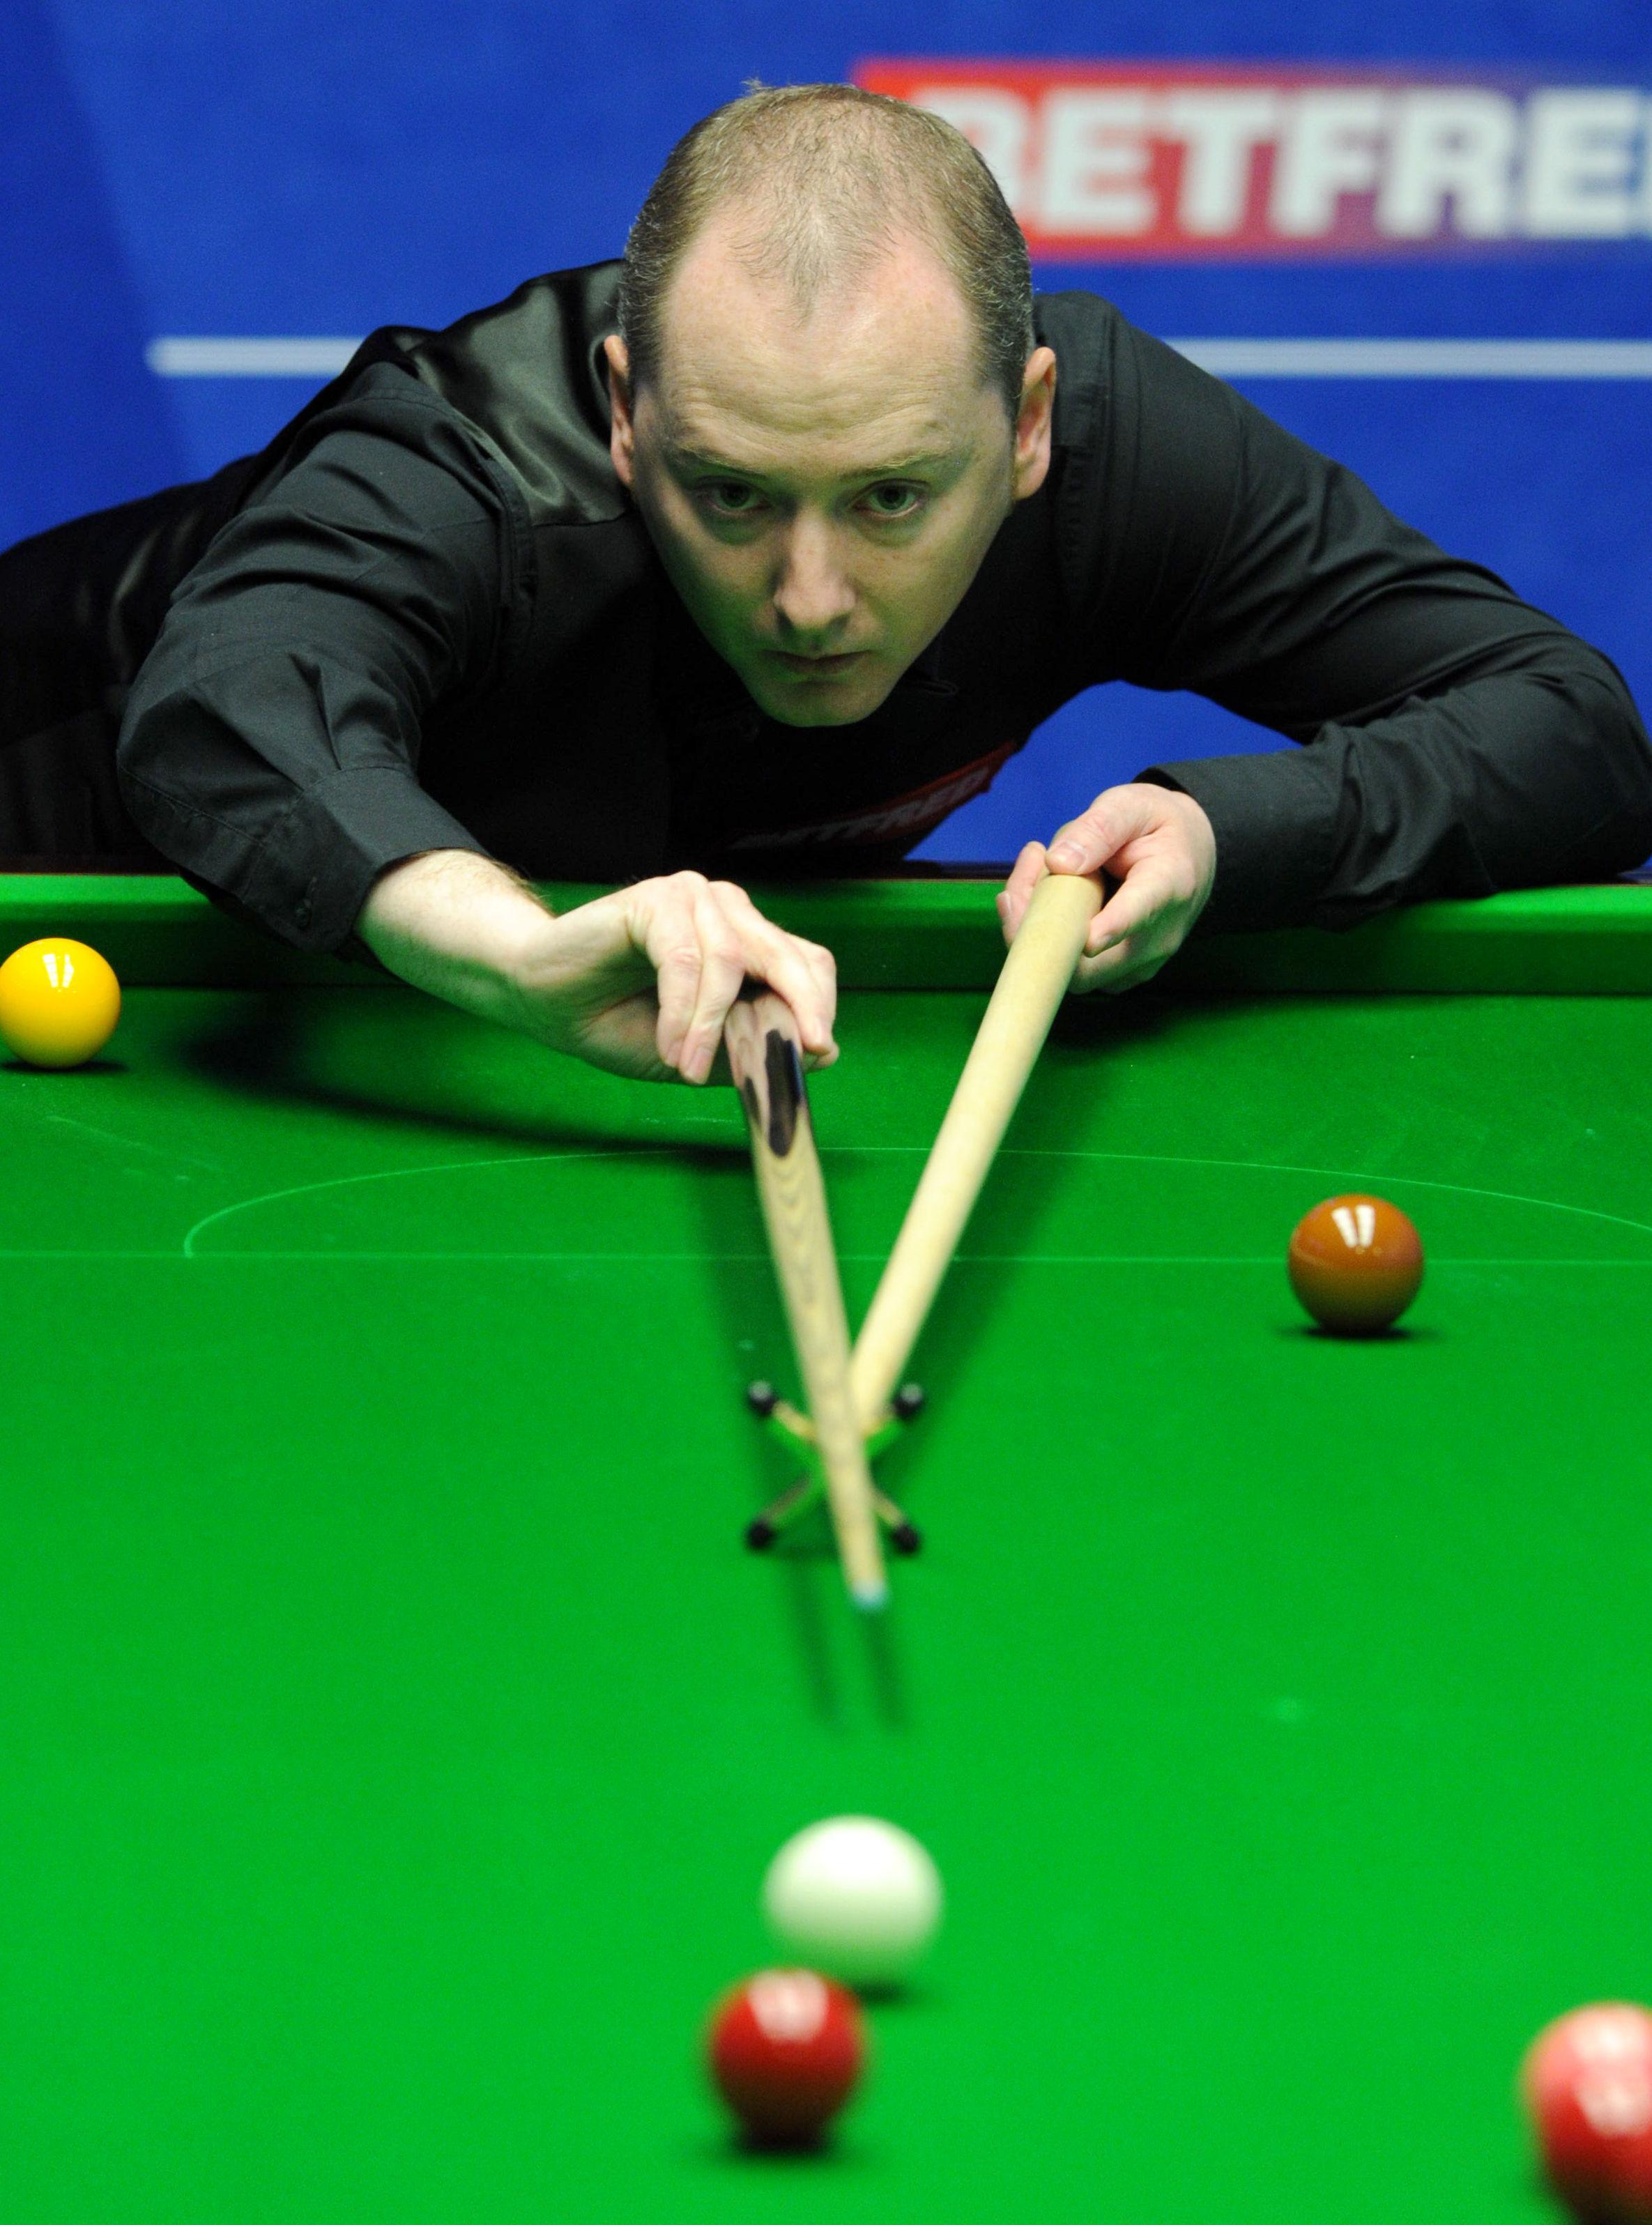 Jones allegedly influenced the outcome of a Graeme Dott match against David John in 2016, which Dott won 6-1